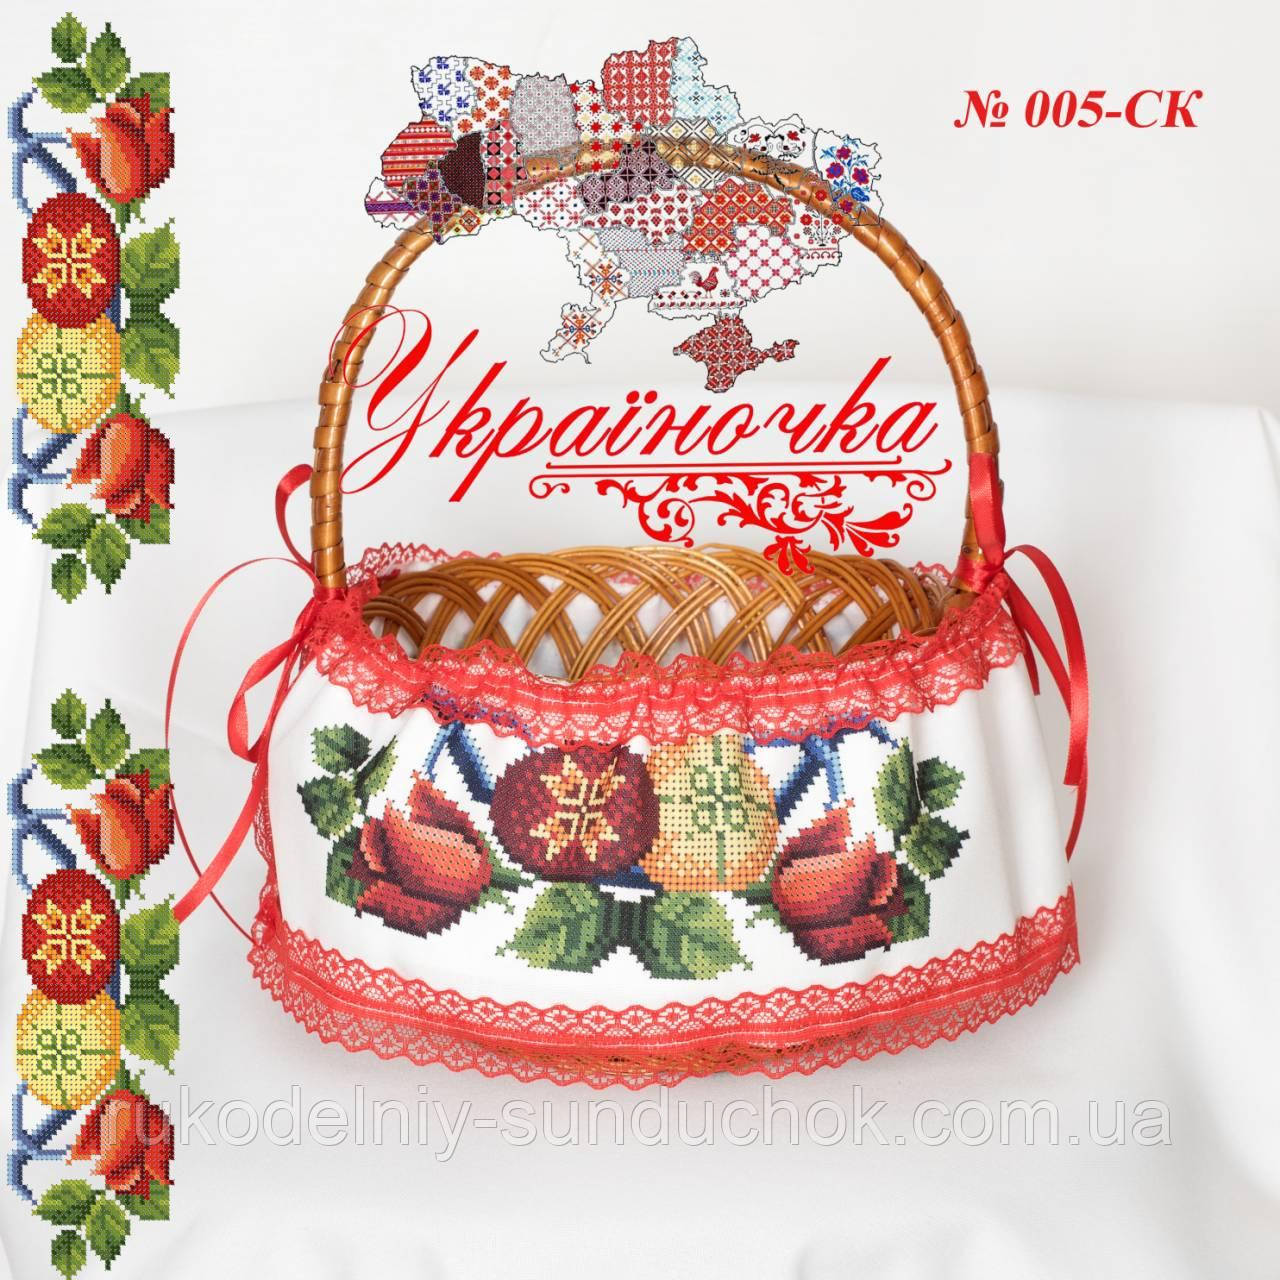 Лента под вышивку на пасхальную корзину ТМ Украиночка 005-СК